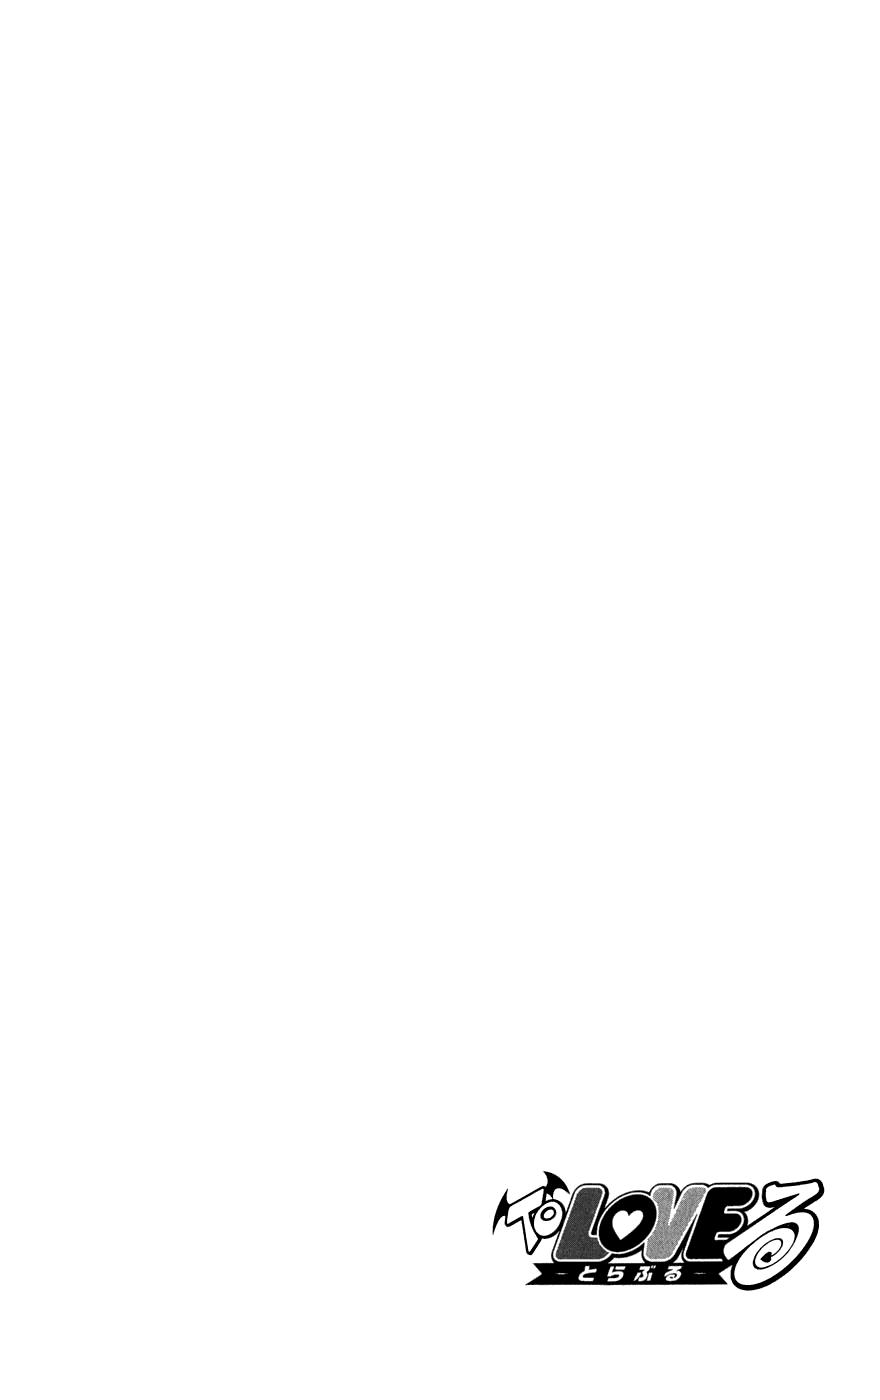 Манга Любовные неприятности / To Love-Ru  - Том 8 Глава 67 Страница 20